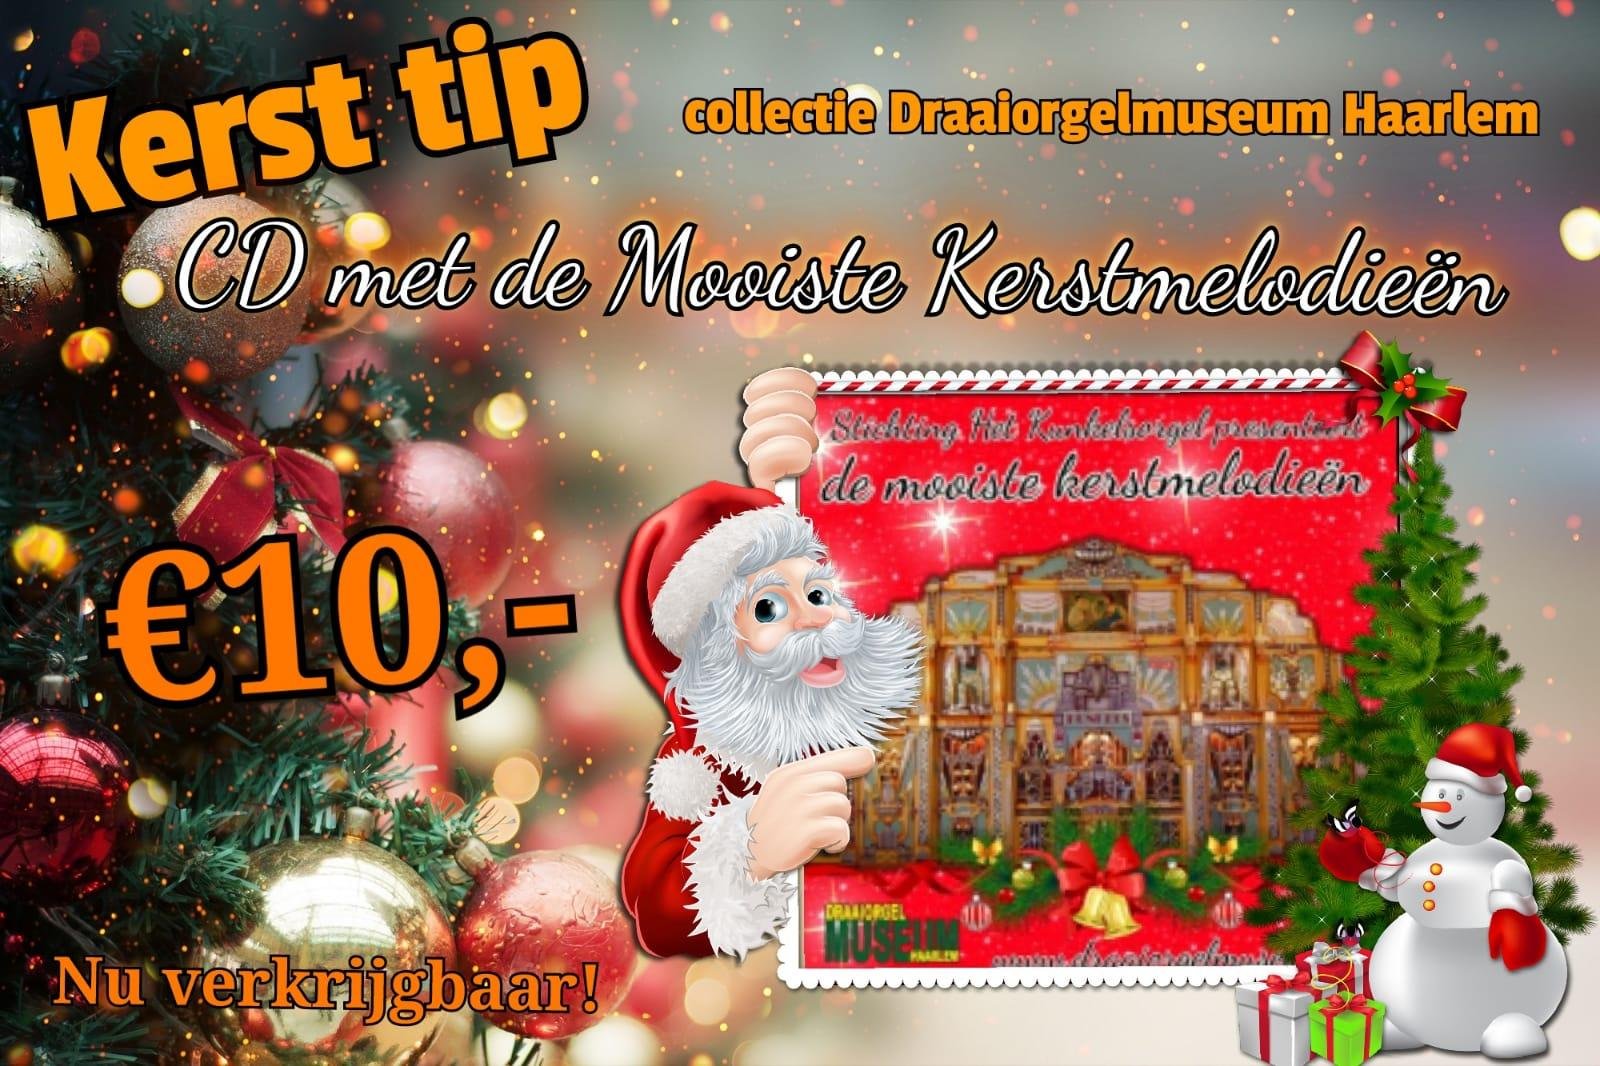 Haarlems Draaiorgelmuseum komt met speciale kerst-cd